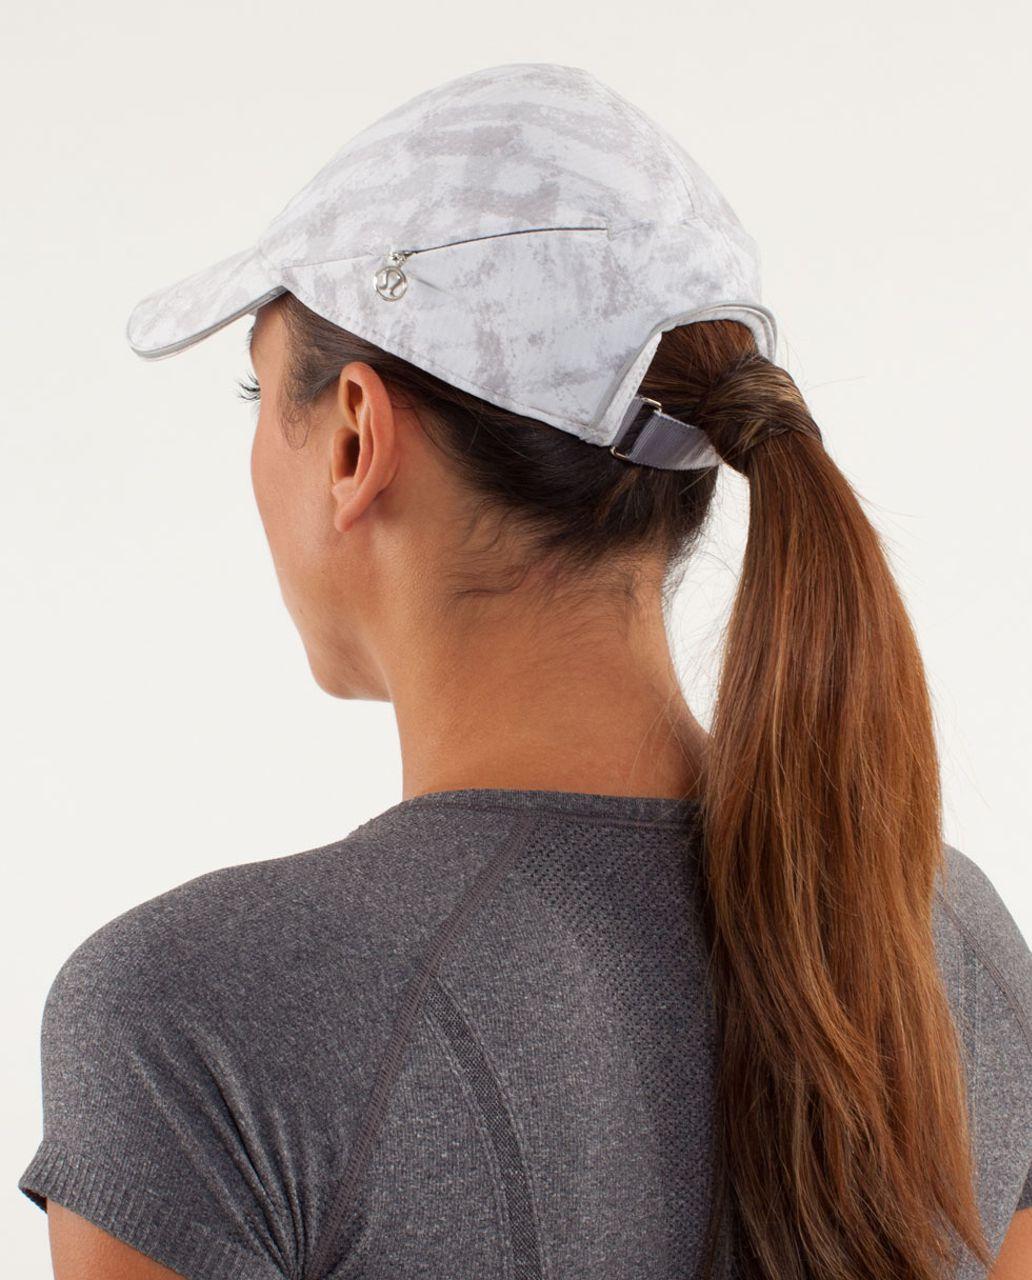 Lululemon Go The Distance Run Hat - Blazer Print   White - lulu fanatics 3e2d45bb437f